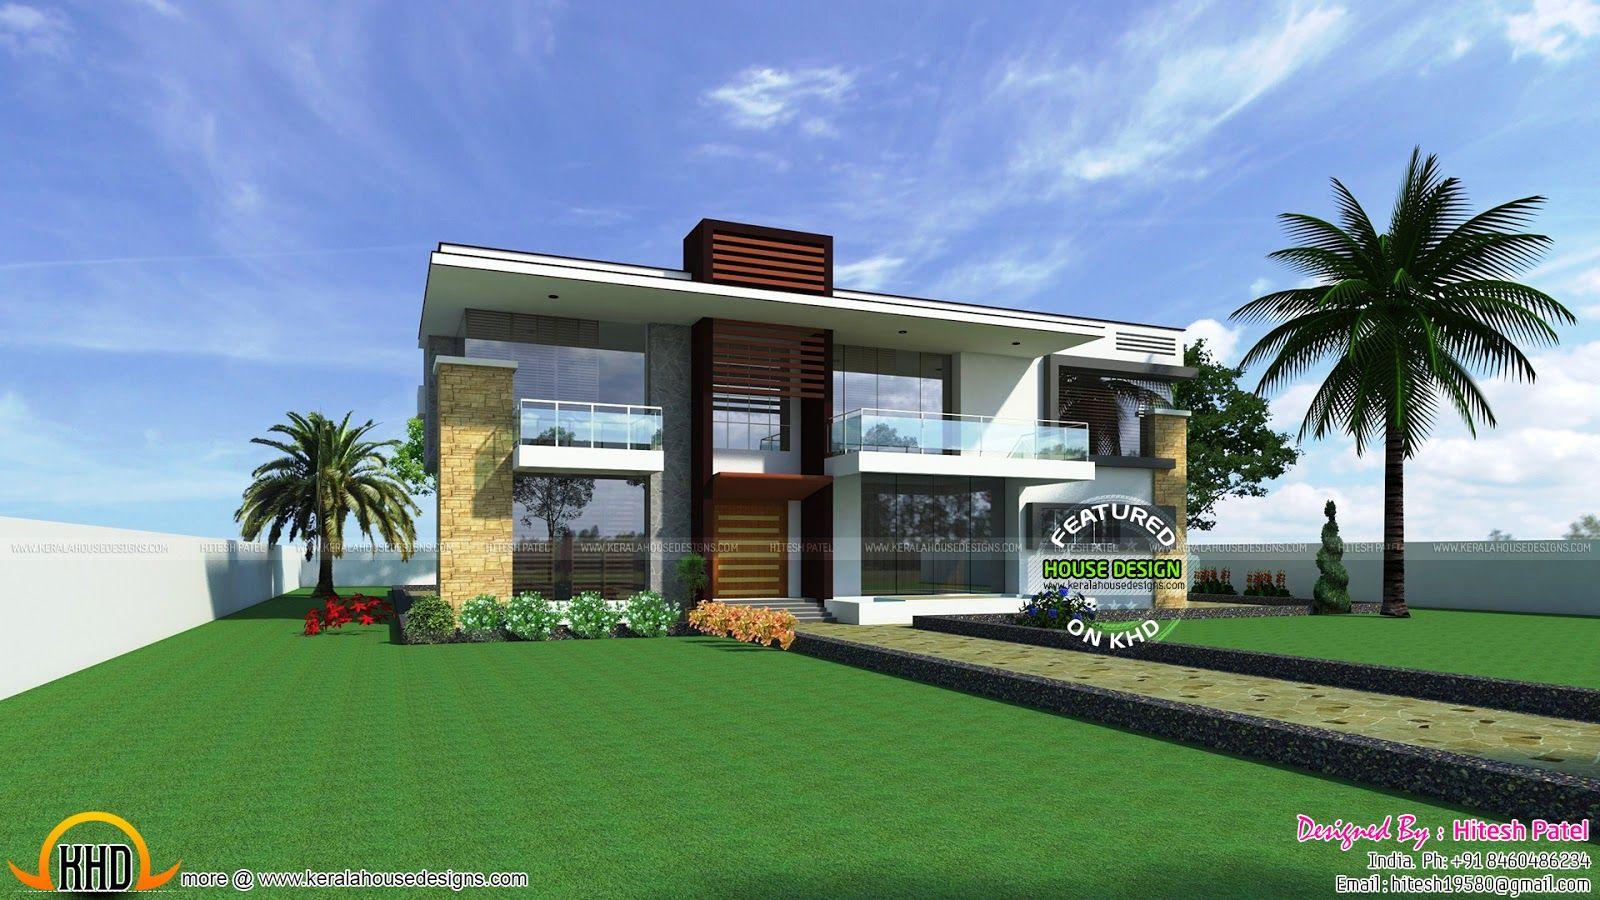 Indian Contemporary House Kerala Home Design Floor Plans Bedroom American Indian Contemporary Ho Kerala House Design Home Design Floor Plans Floor Plan Design